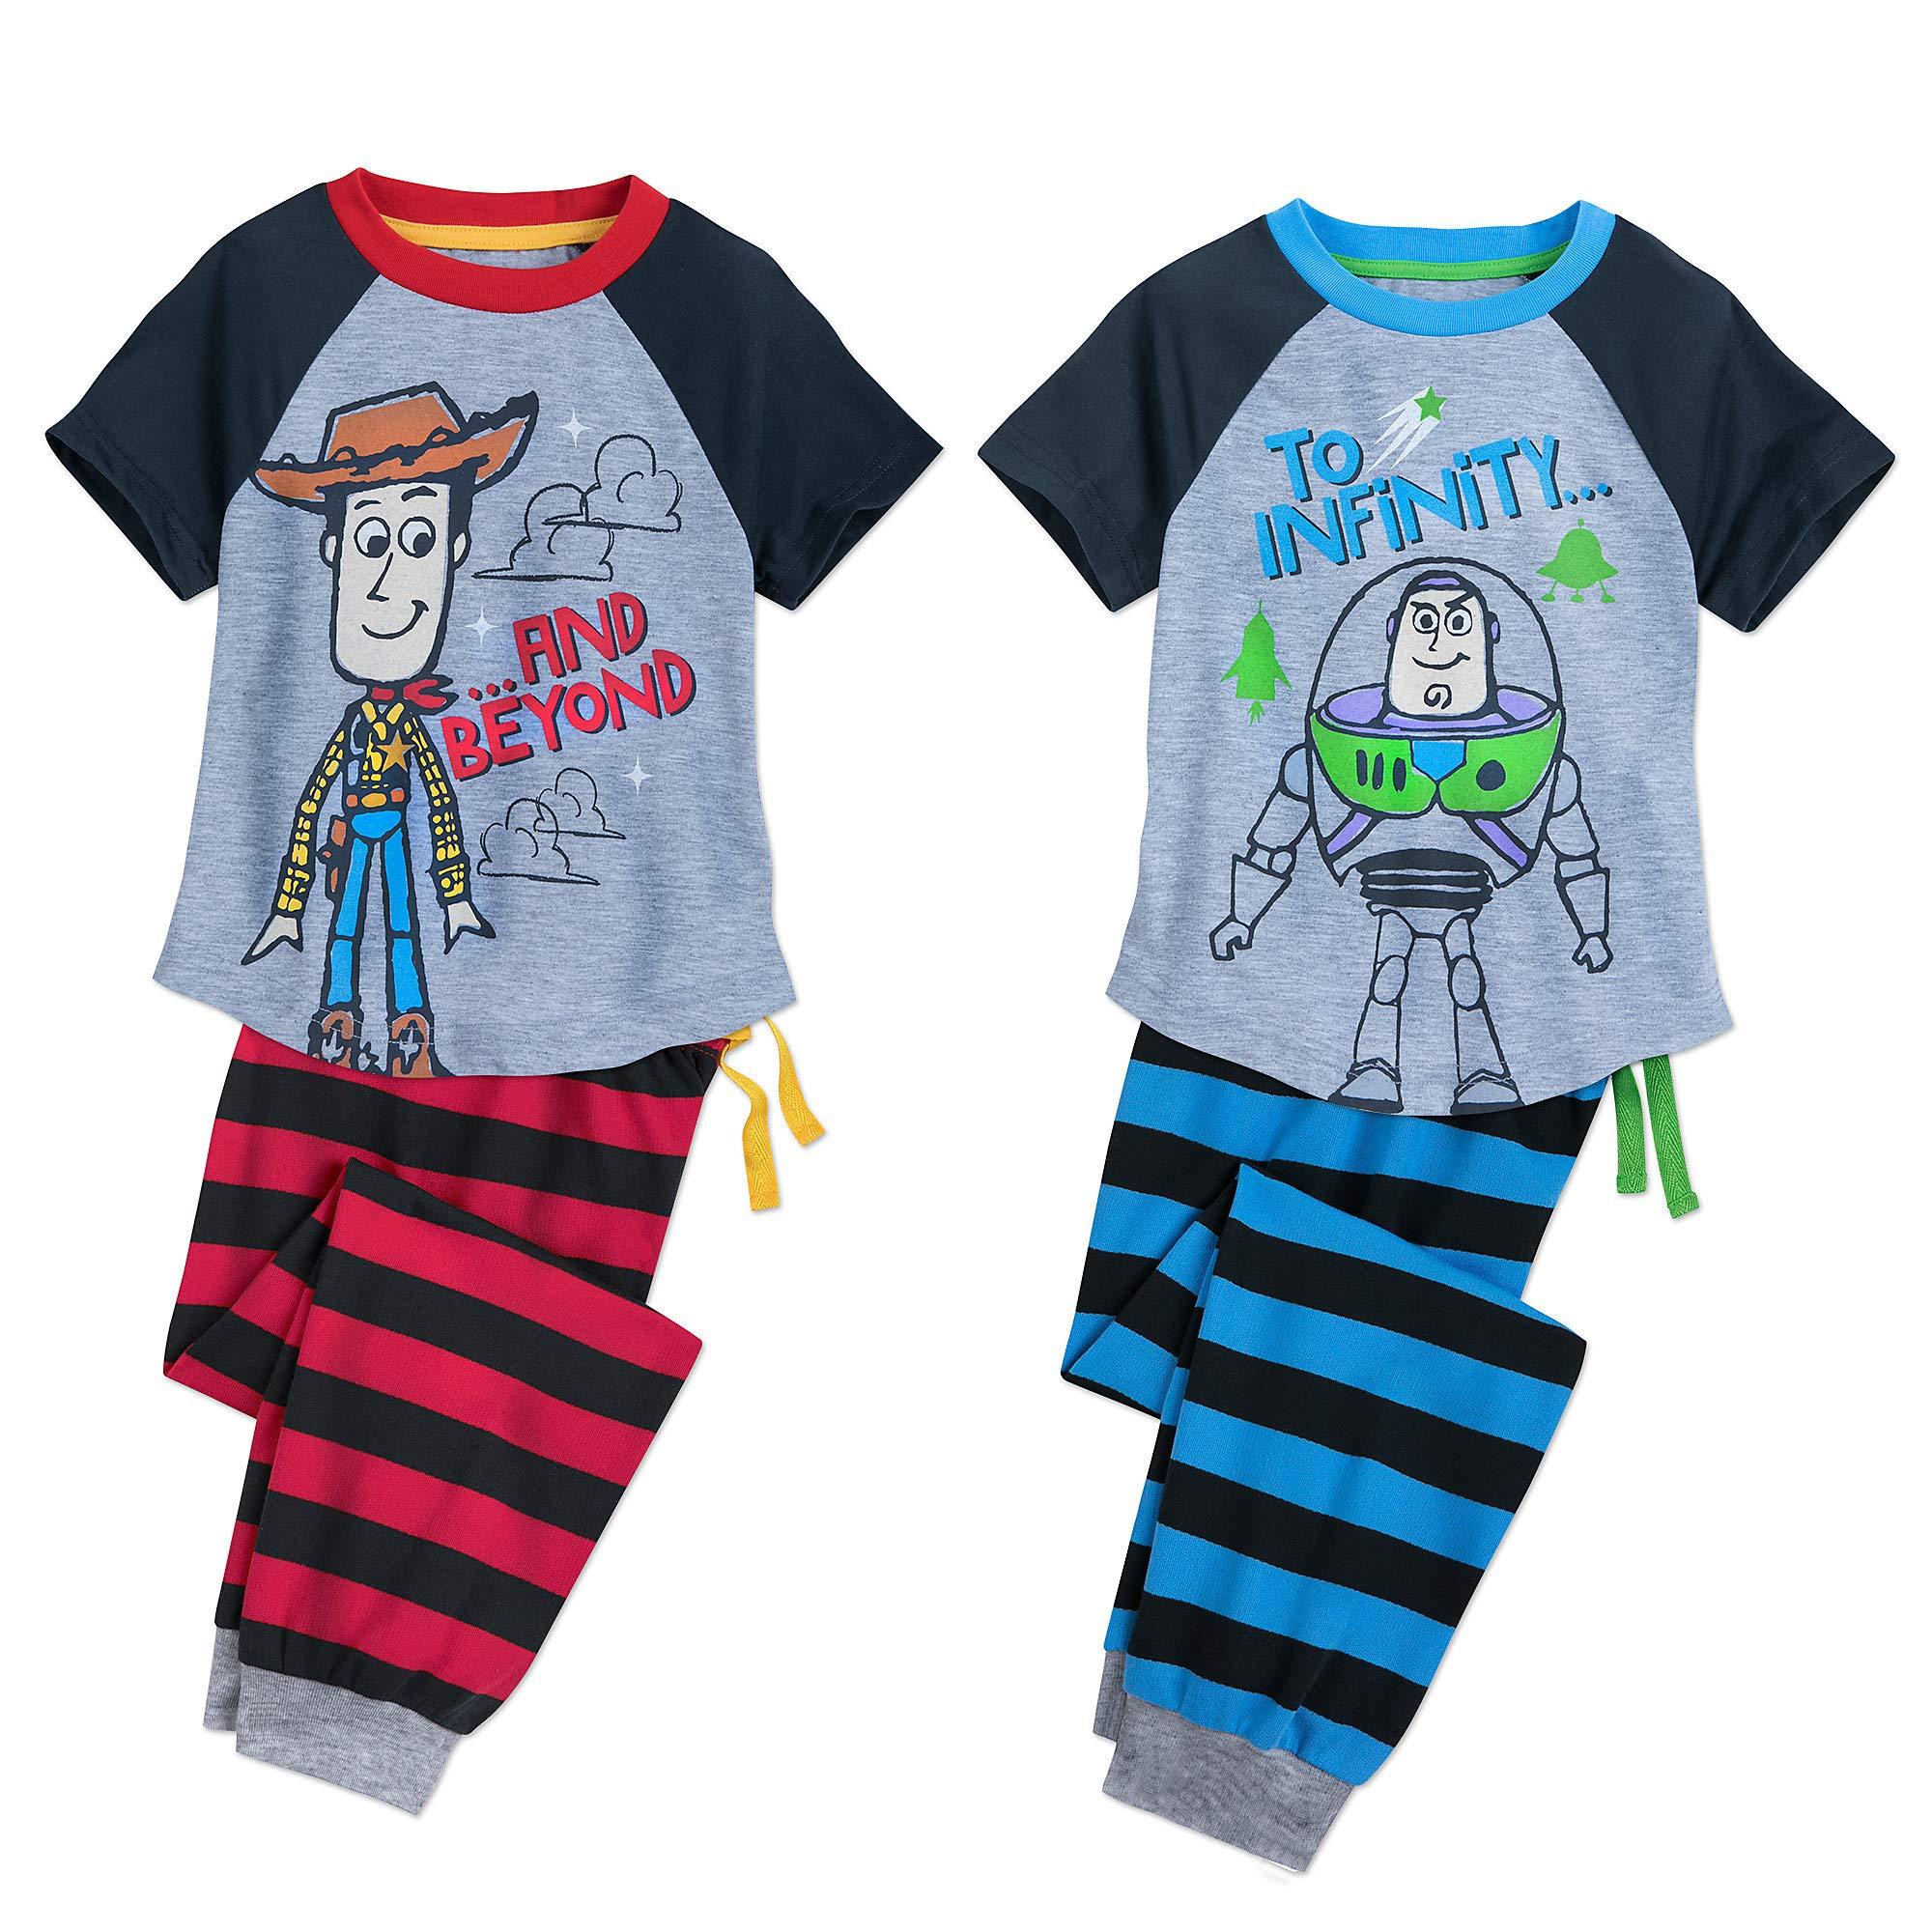 Disney Toy Story Best Friends PJ Sets for Kids - 2-Pack Size 3 Multi449030320182